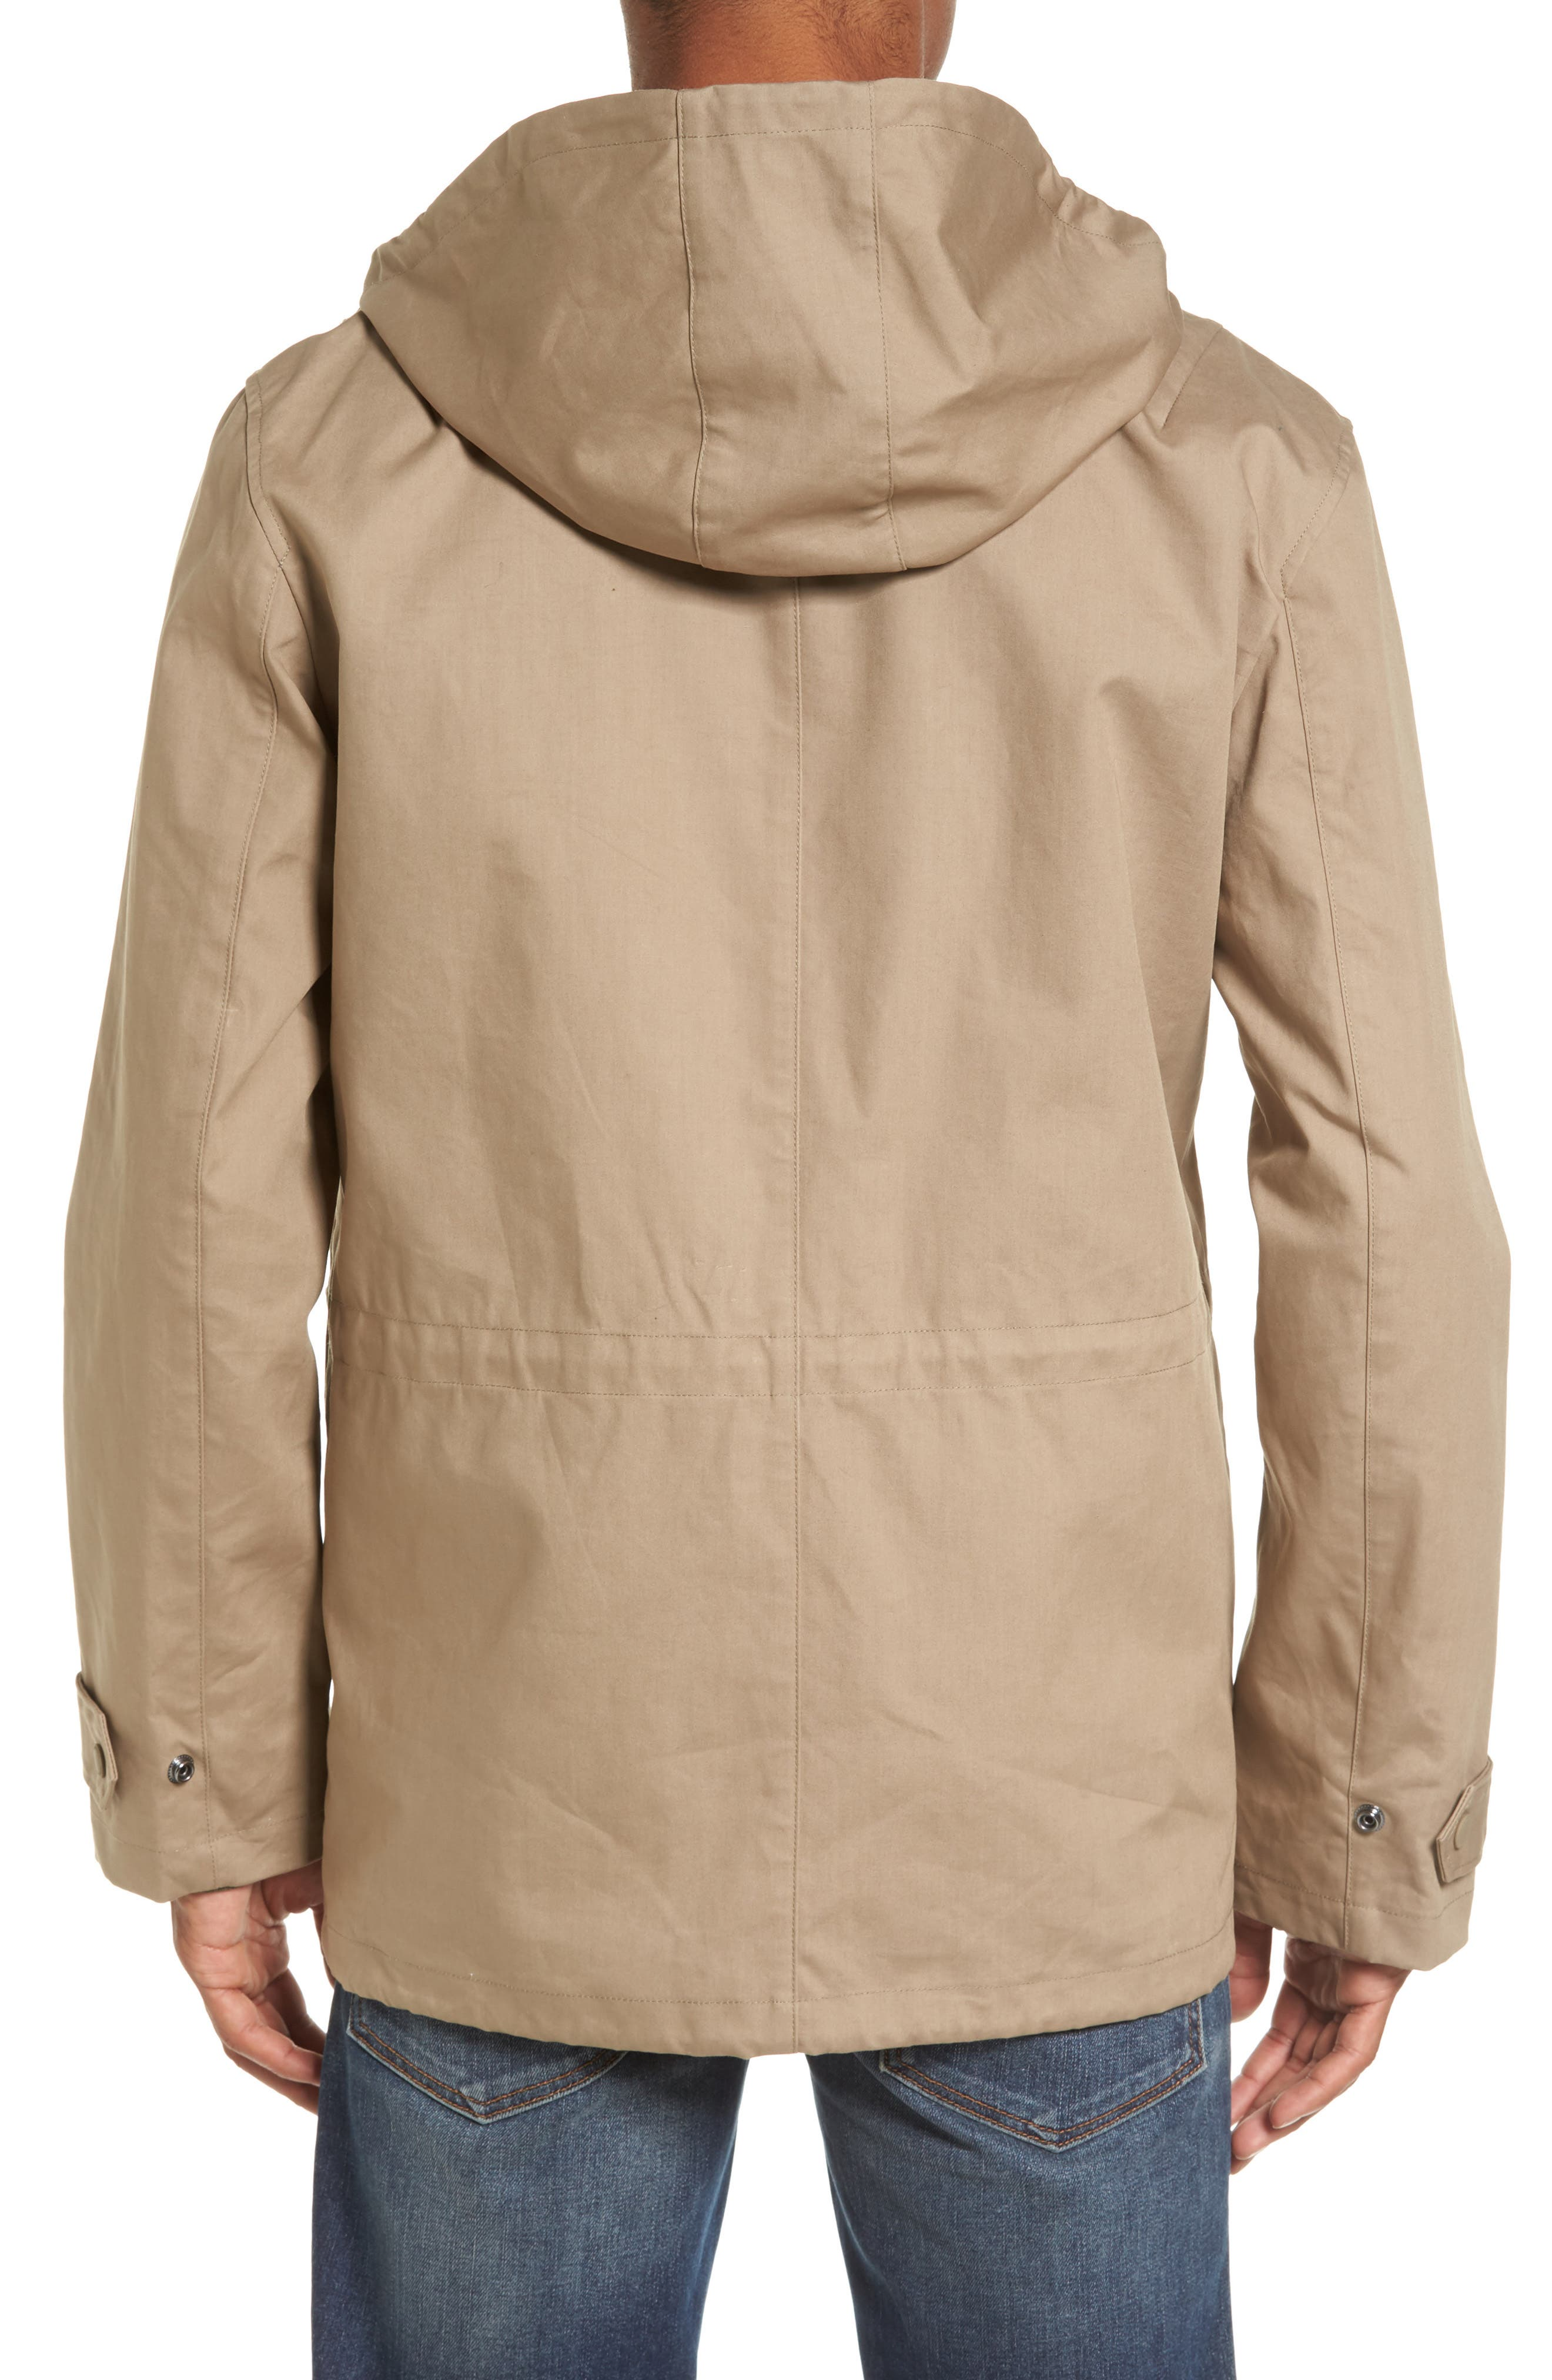 Regular Fit Hooded Rain Jacket,                             Alternate thumbnail 2, color,                             273